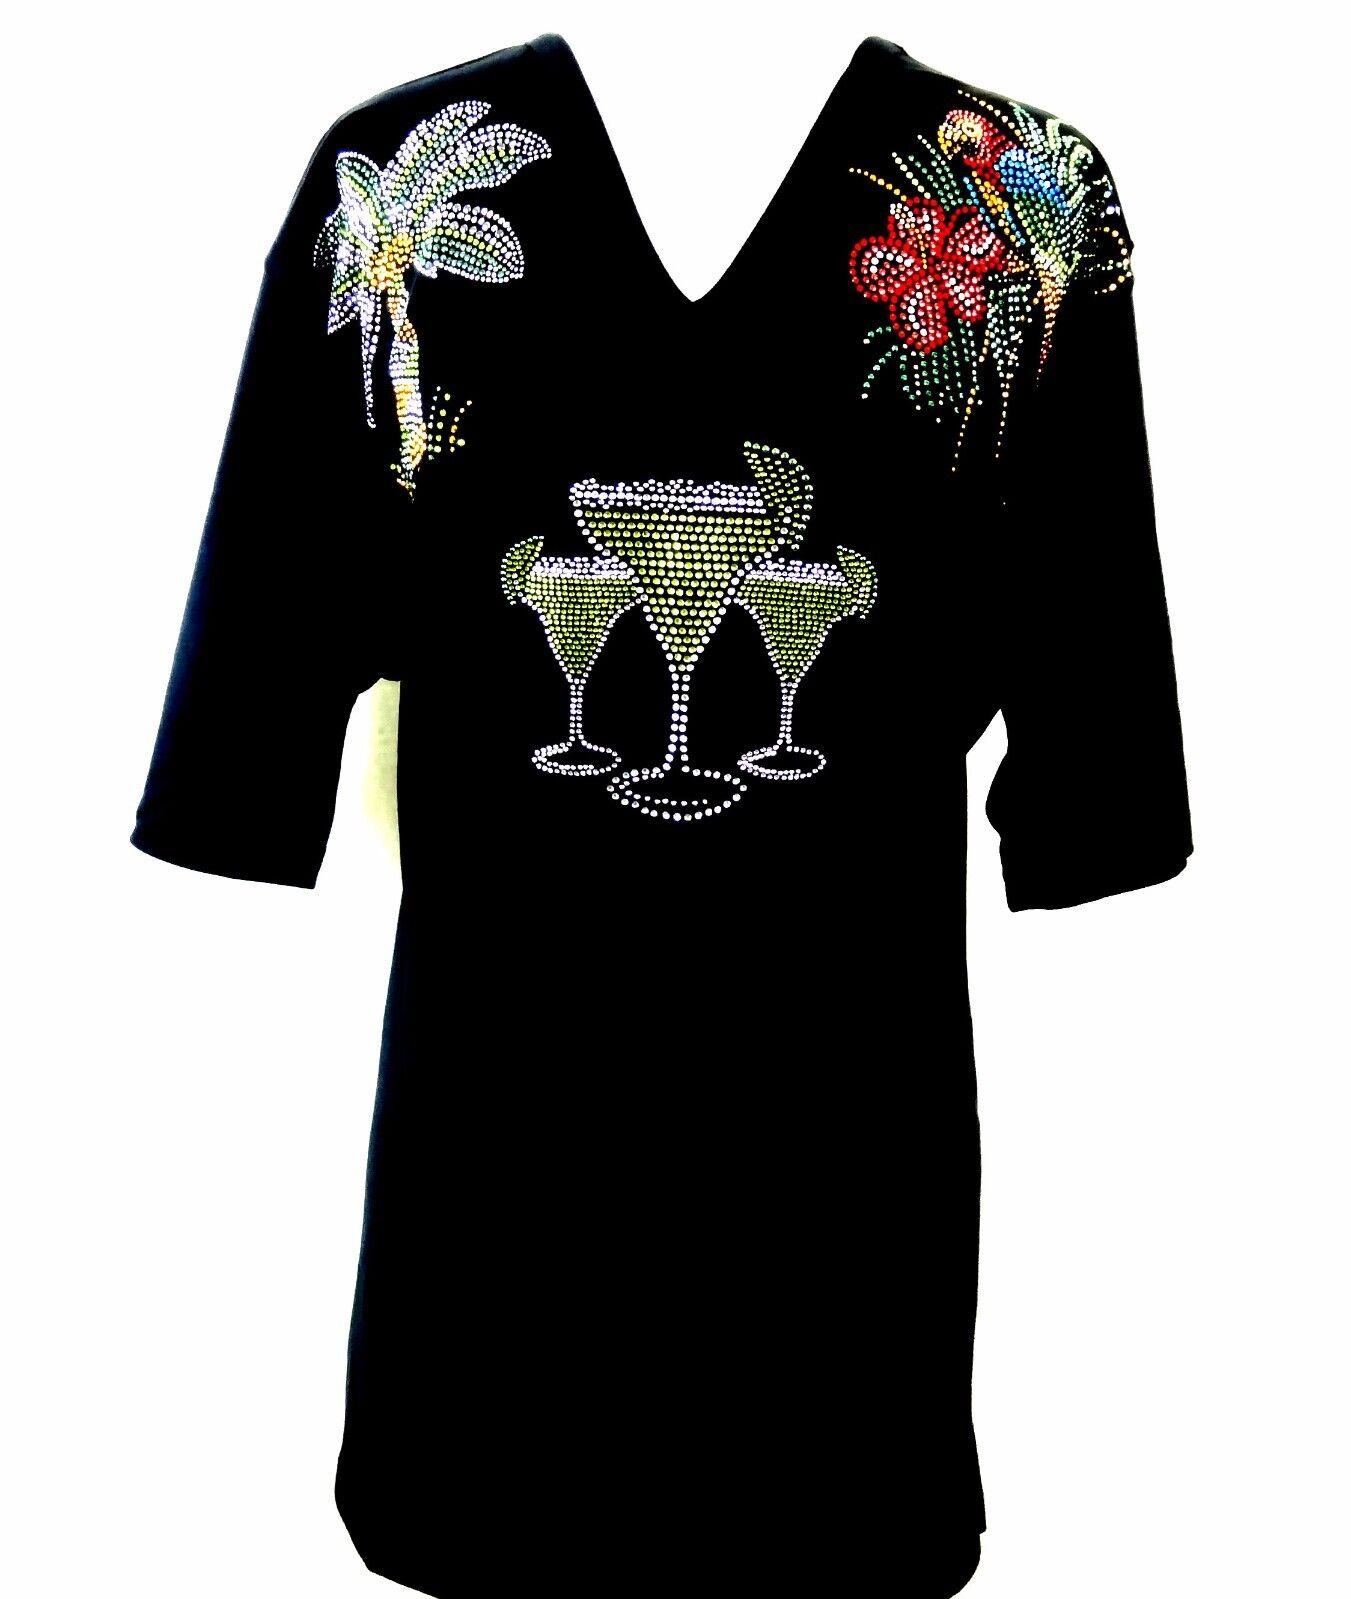 PLUS Größe Hand Embellished Rhinestone Parrot Palm Margarita's Short Sleeve Top